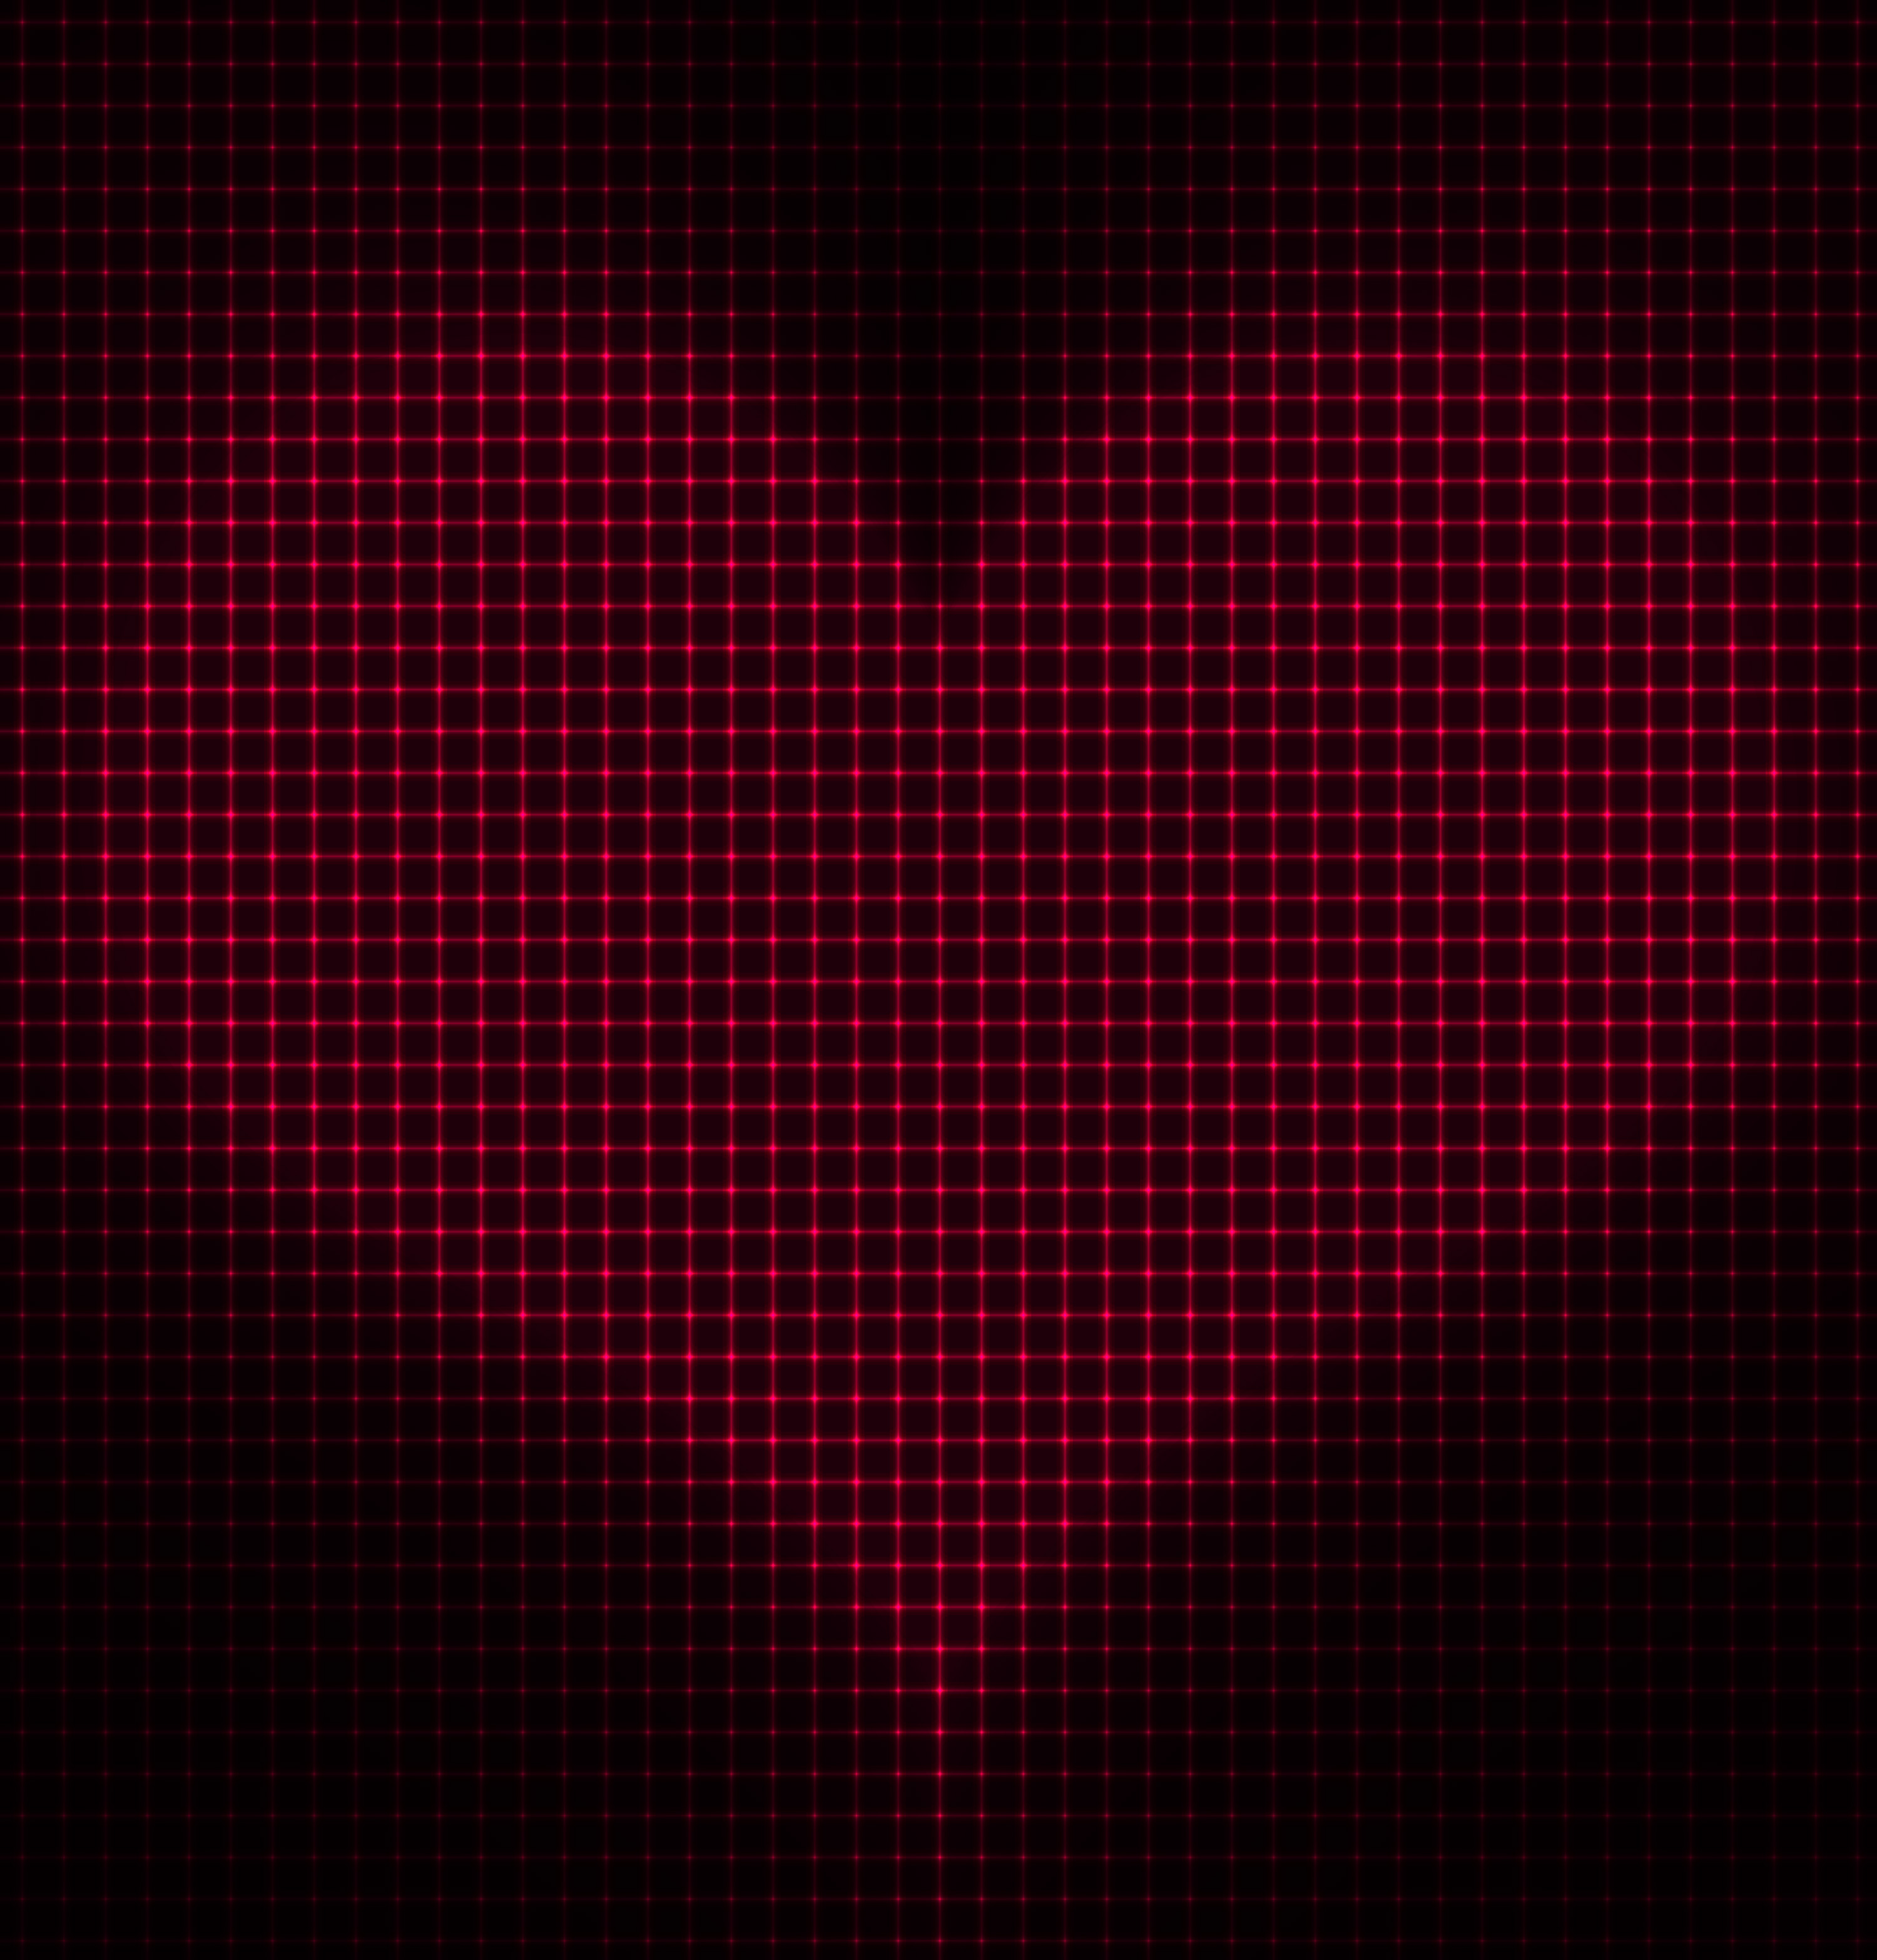 red hearts black background   wallpapersafari